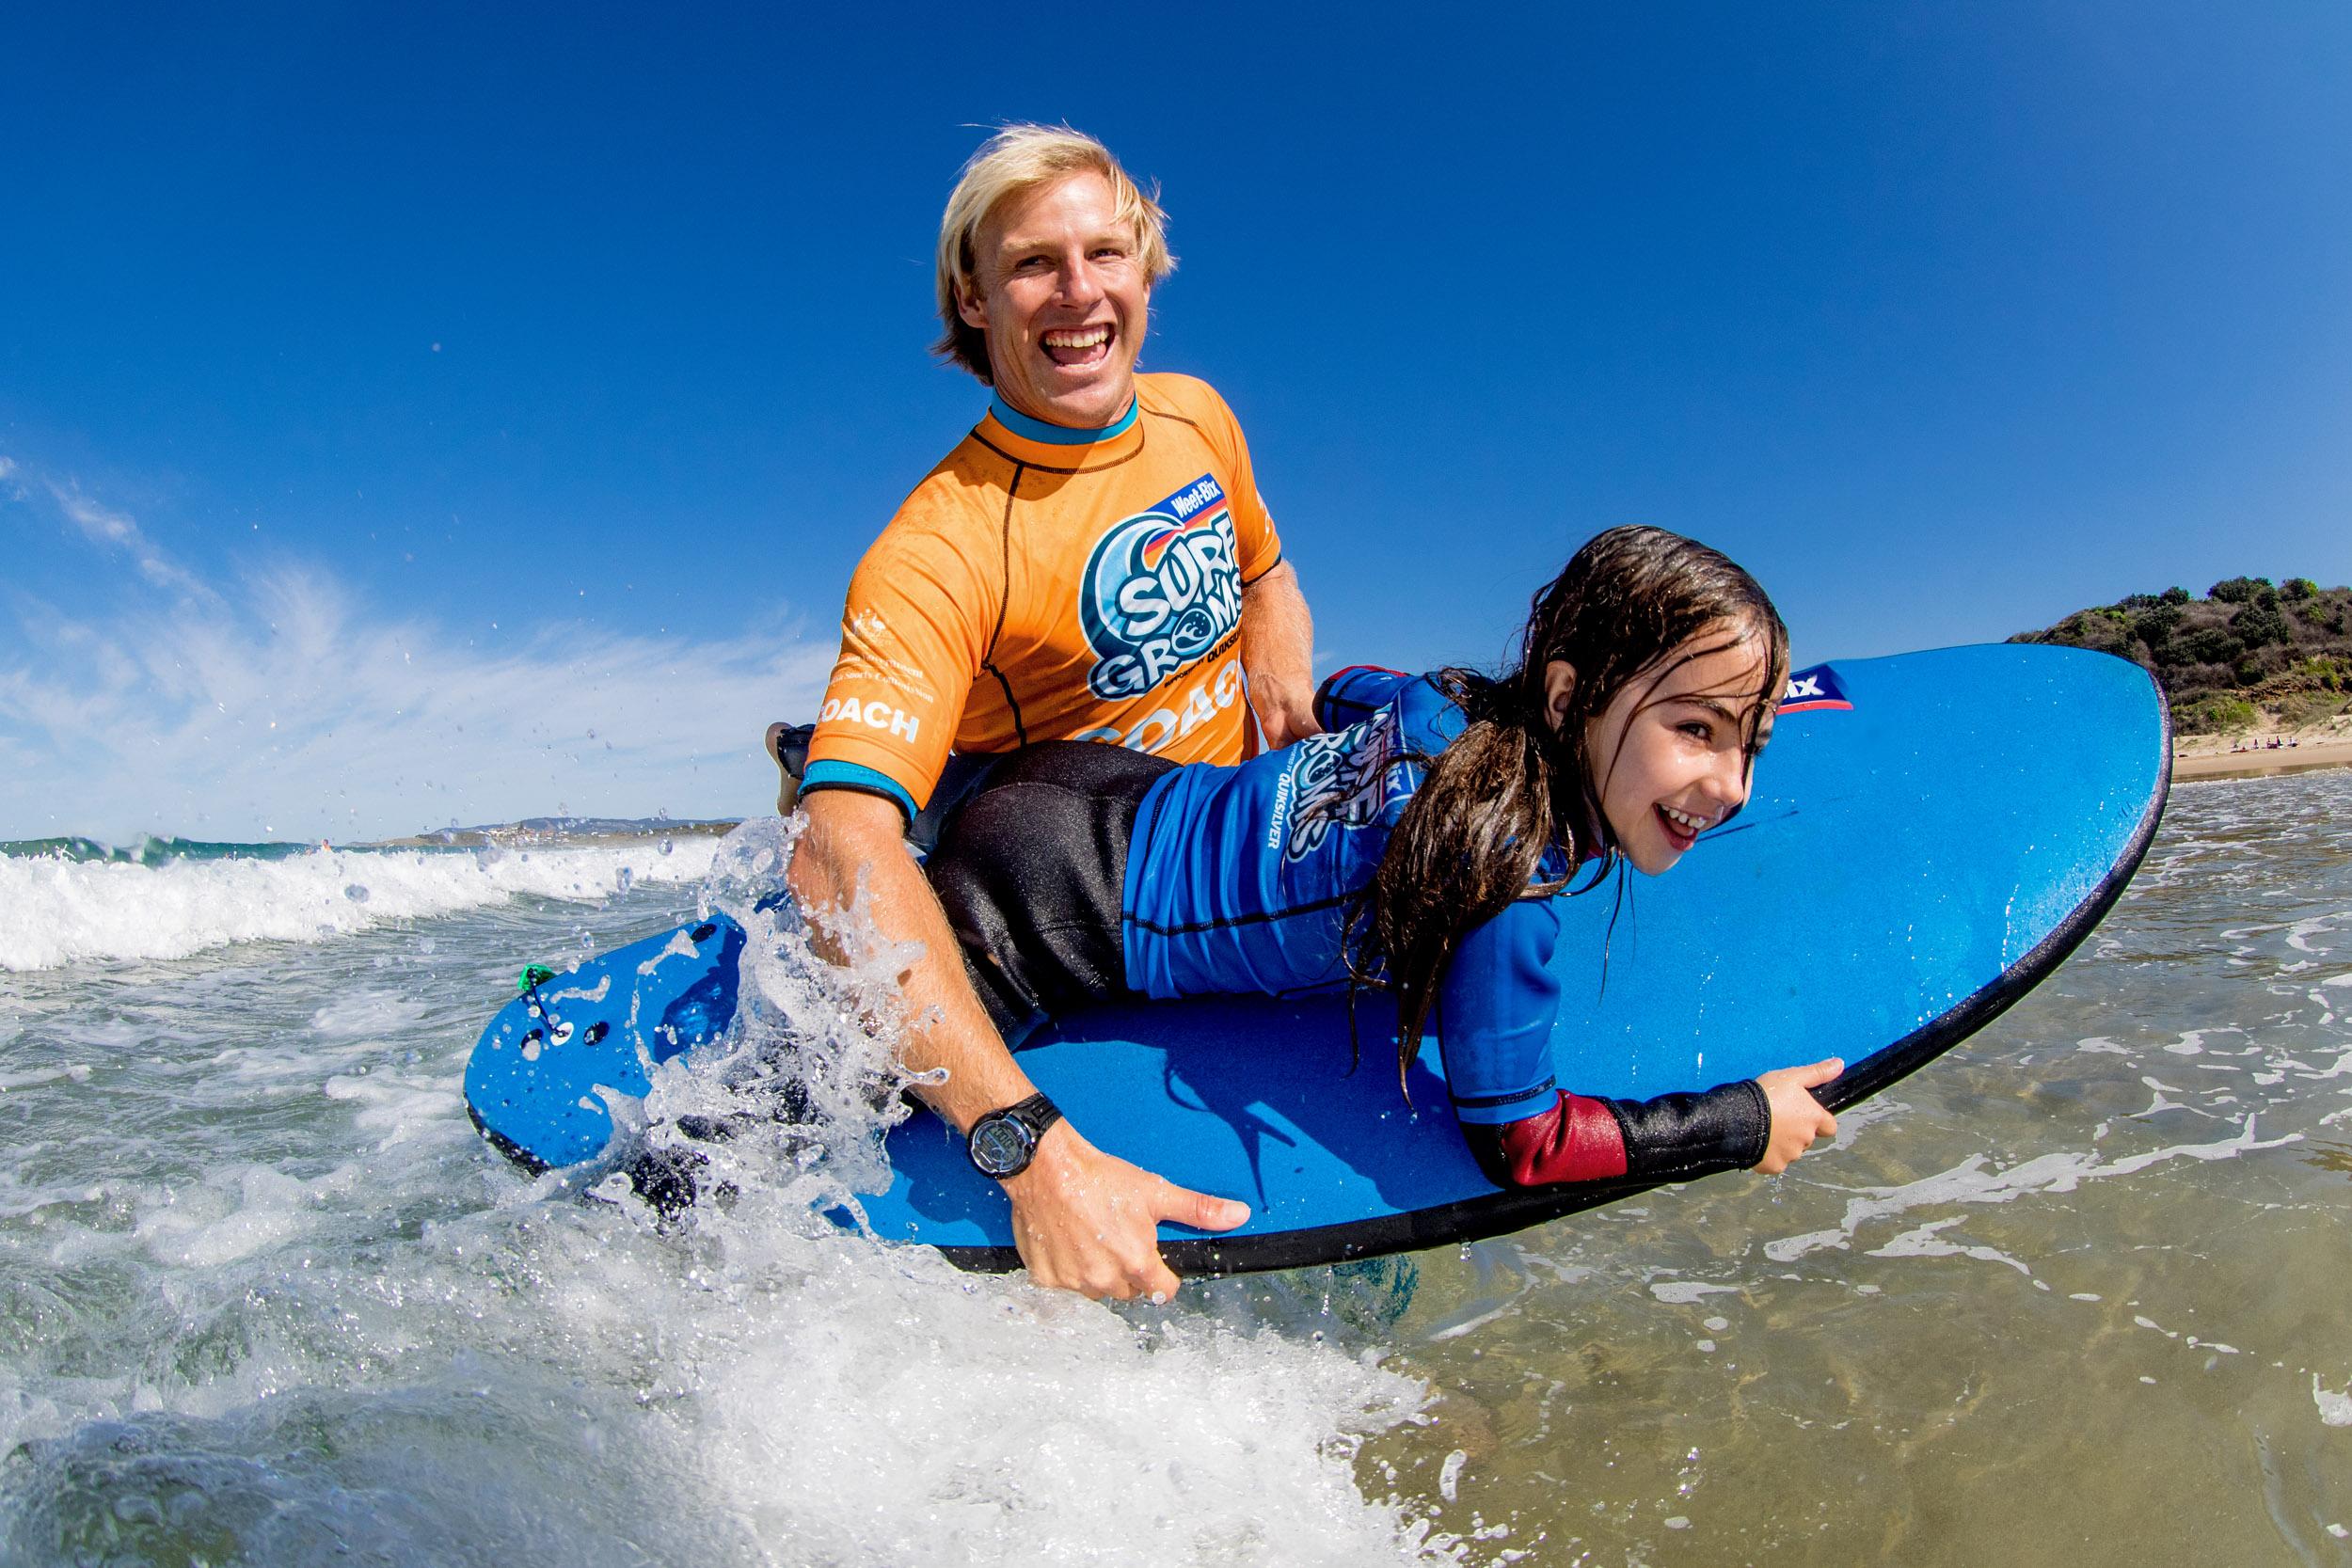 surfing-australia-surf-groms-photography-SGWB-330.jpg